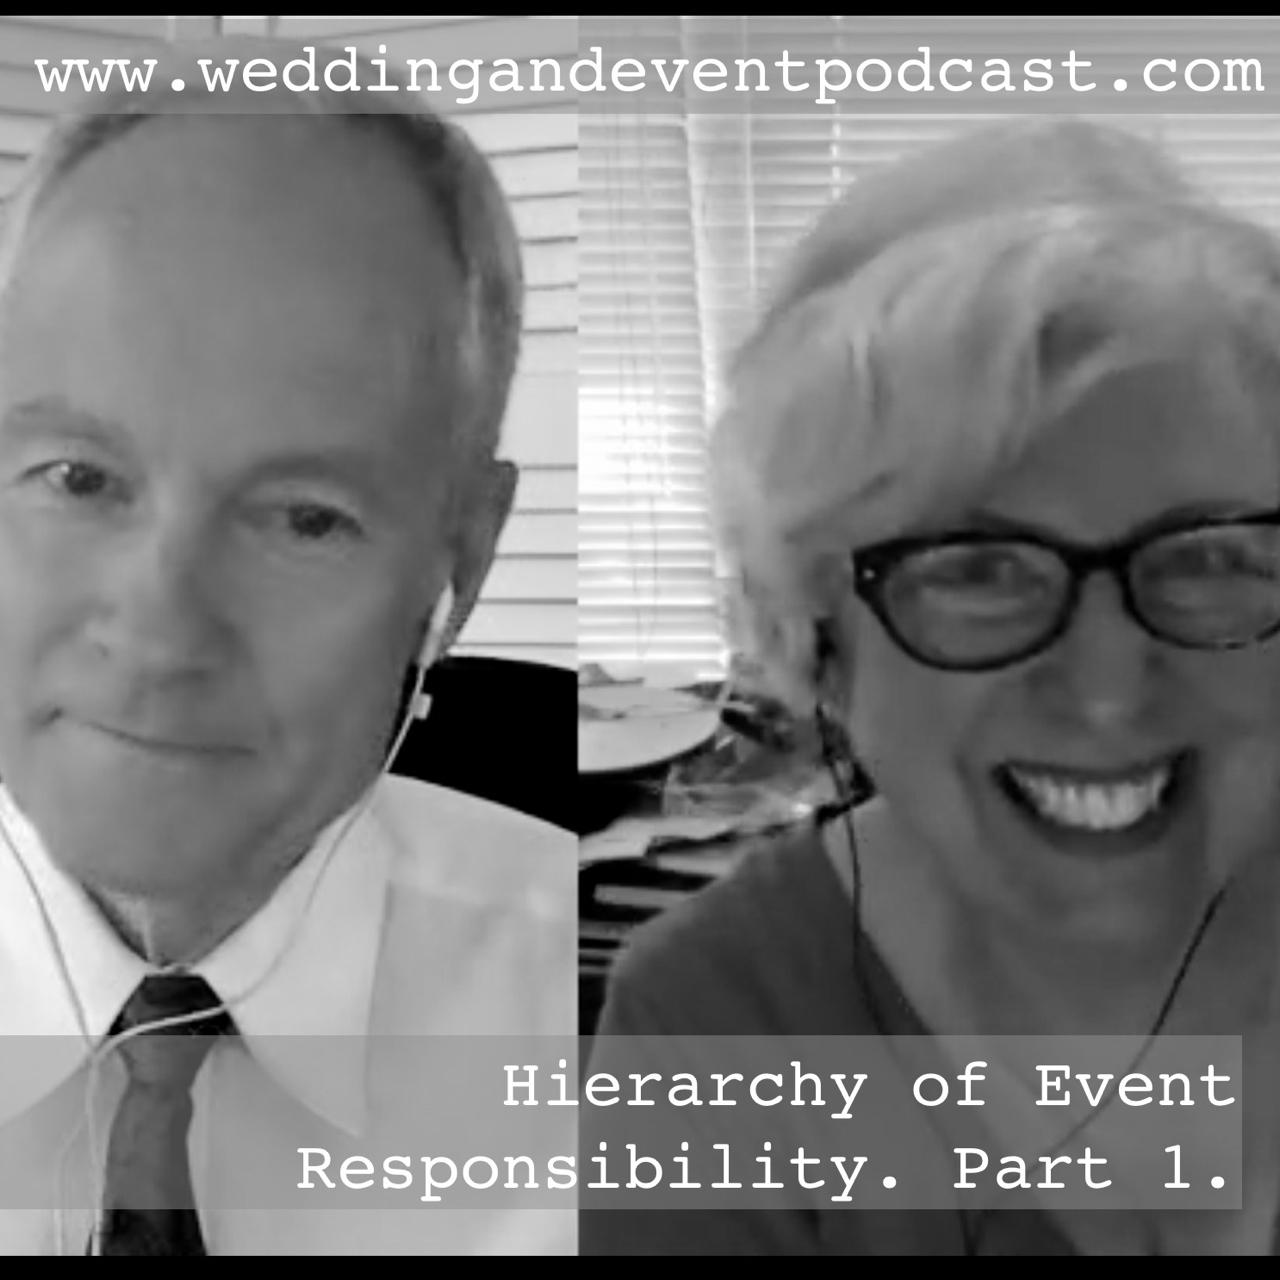 podcastwedding @wedding_and_event_podcast